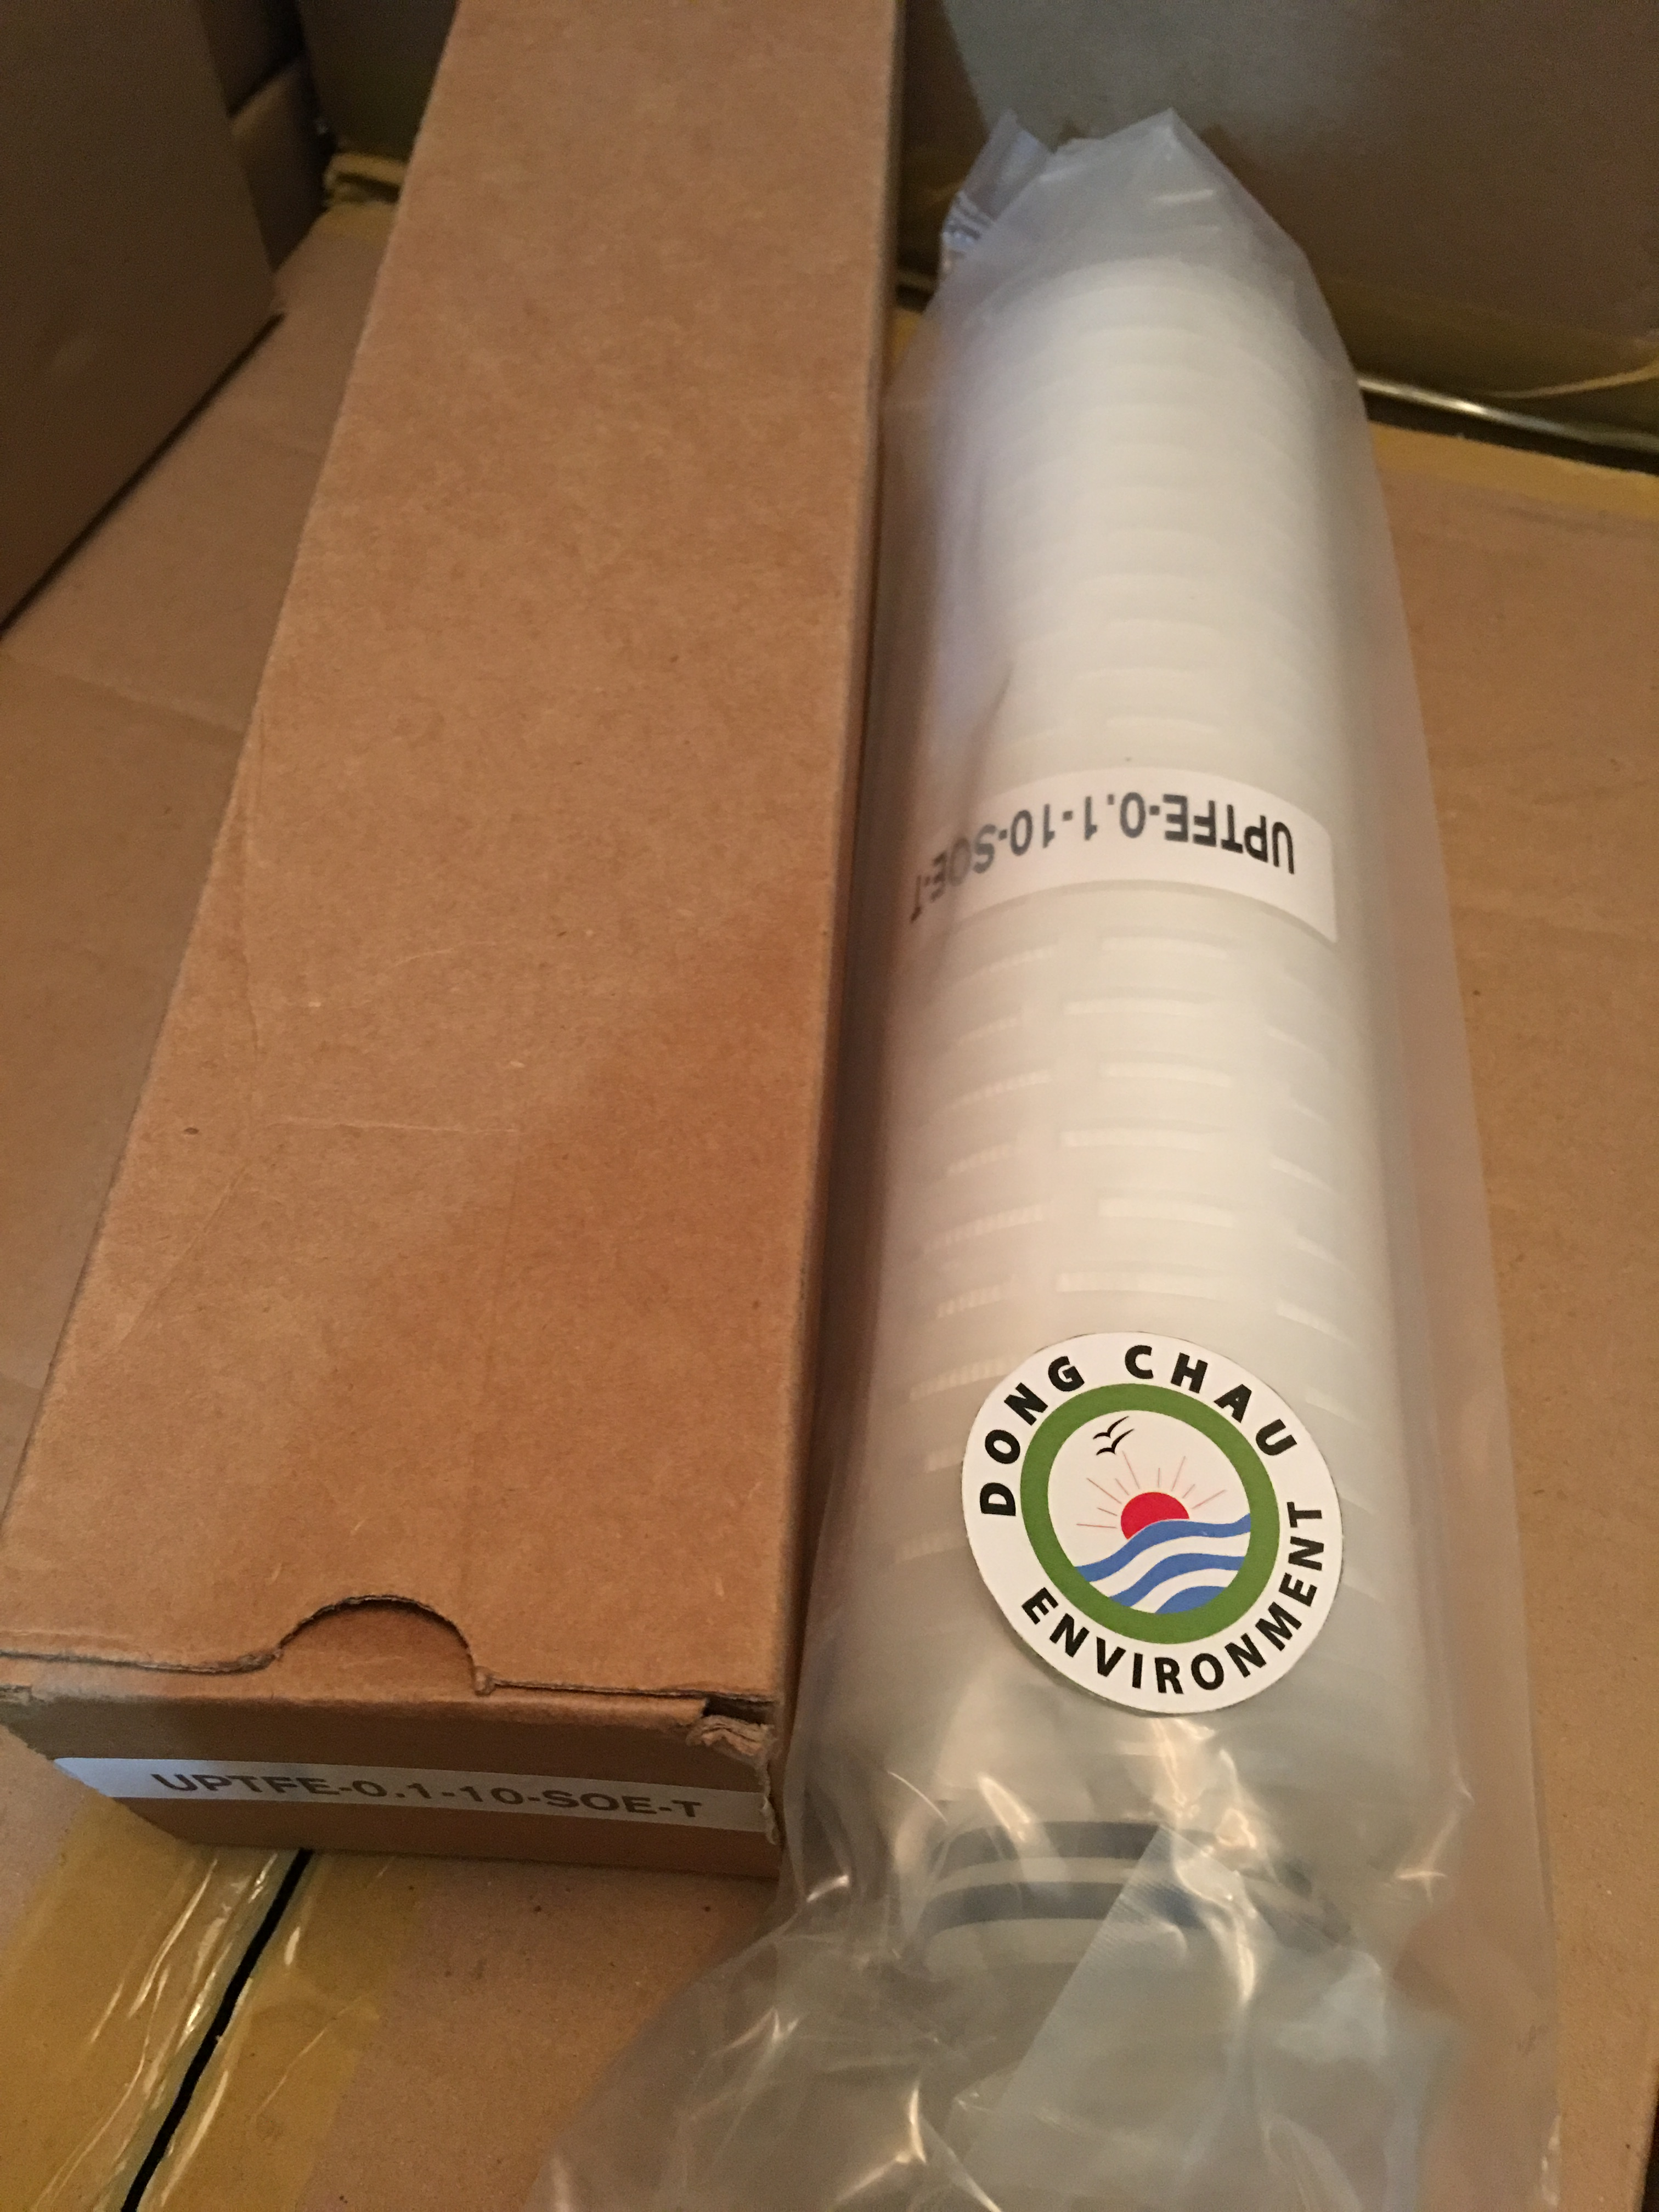 Lõi lọc giấy xếp 0.1 micron 10 inch UPTFE Singapore